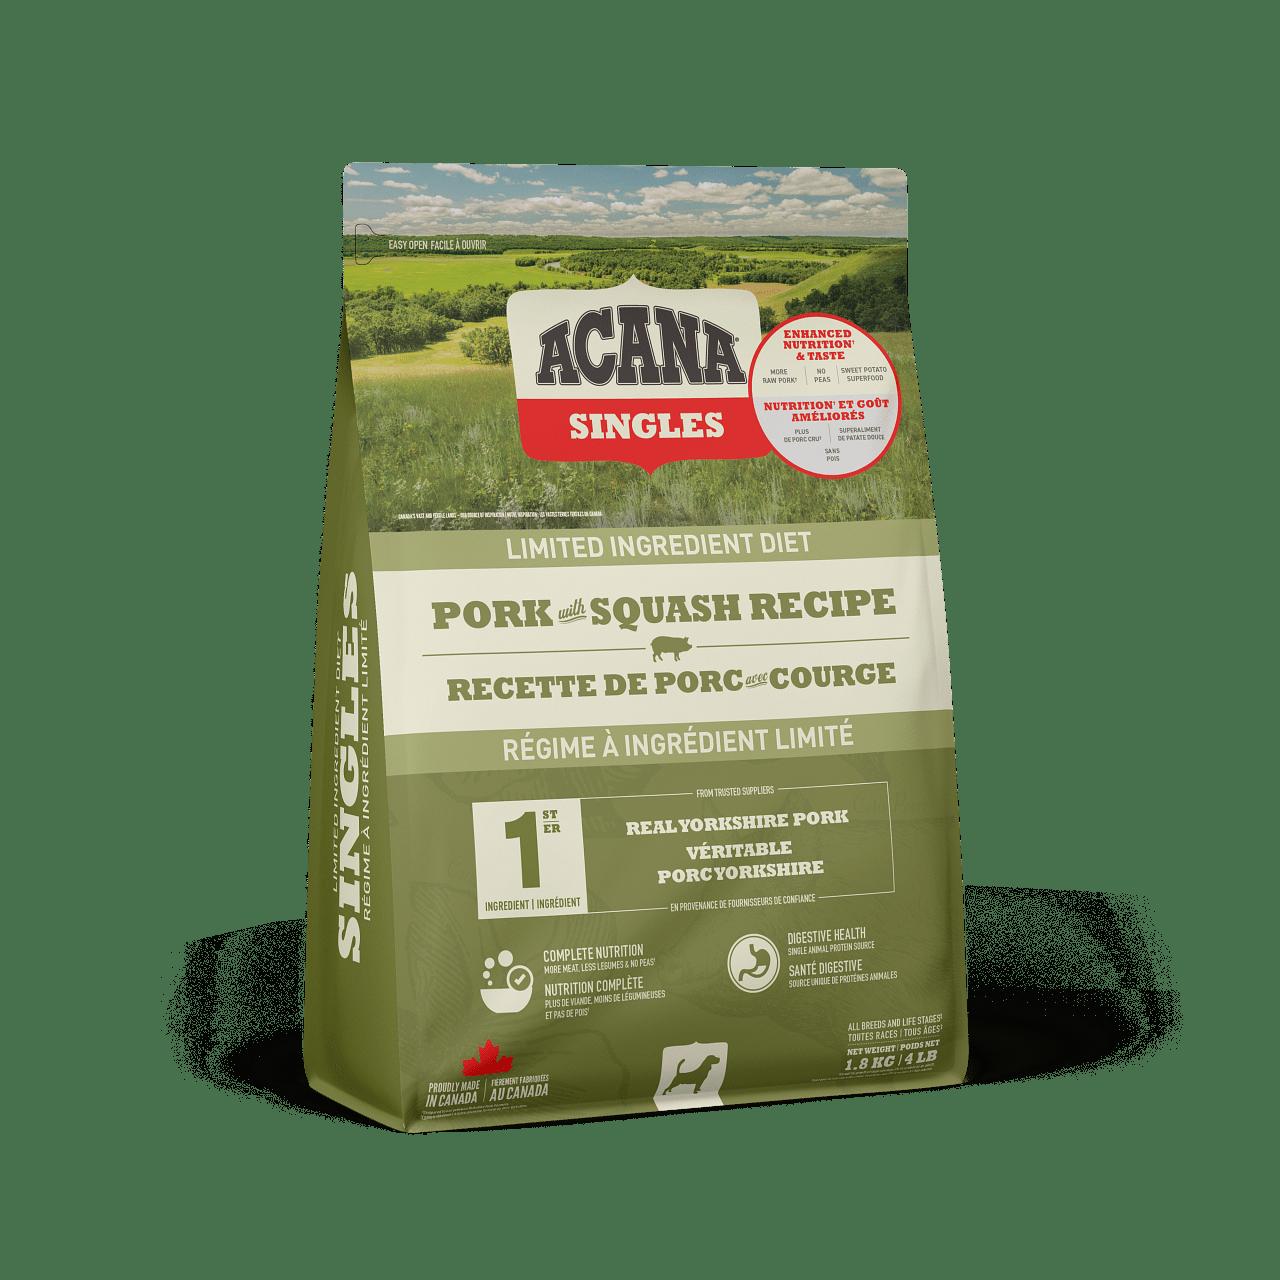 ACANA Singles Limited Ingredient Diet Pork & Squash Recipe Dry Dog Food, 1.8-kg